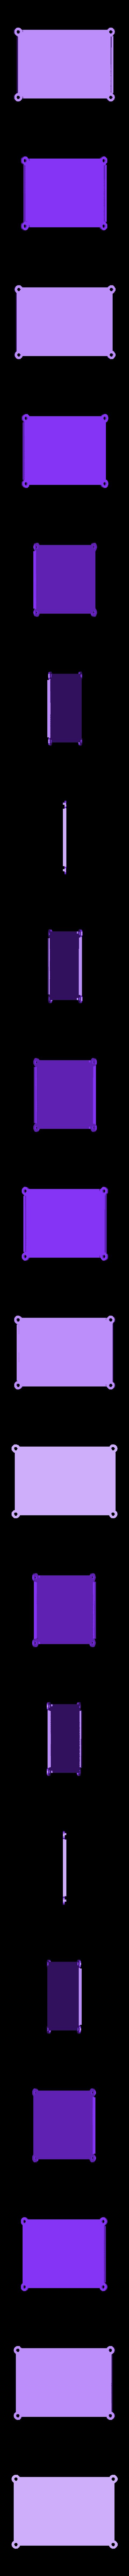 base2.stl Download free SCAD file Modular raspberry pi case • 3D print object, Lassaalk